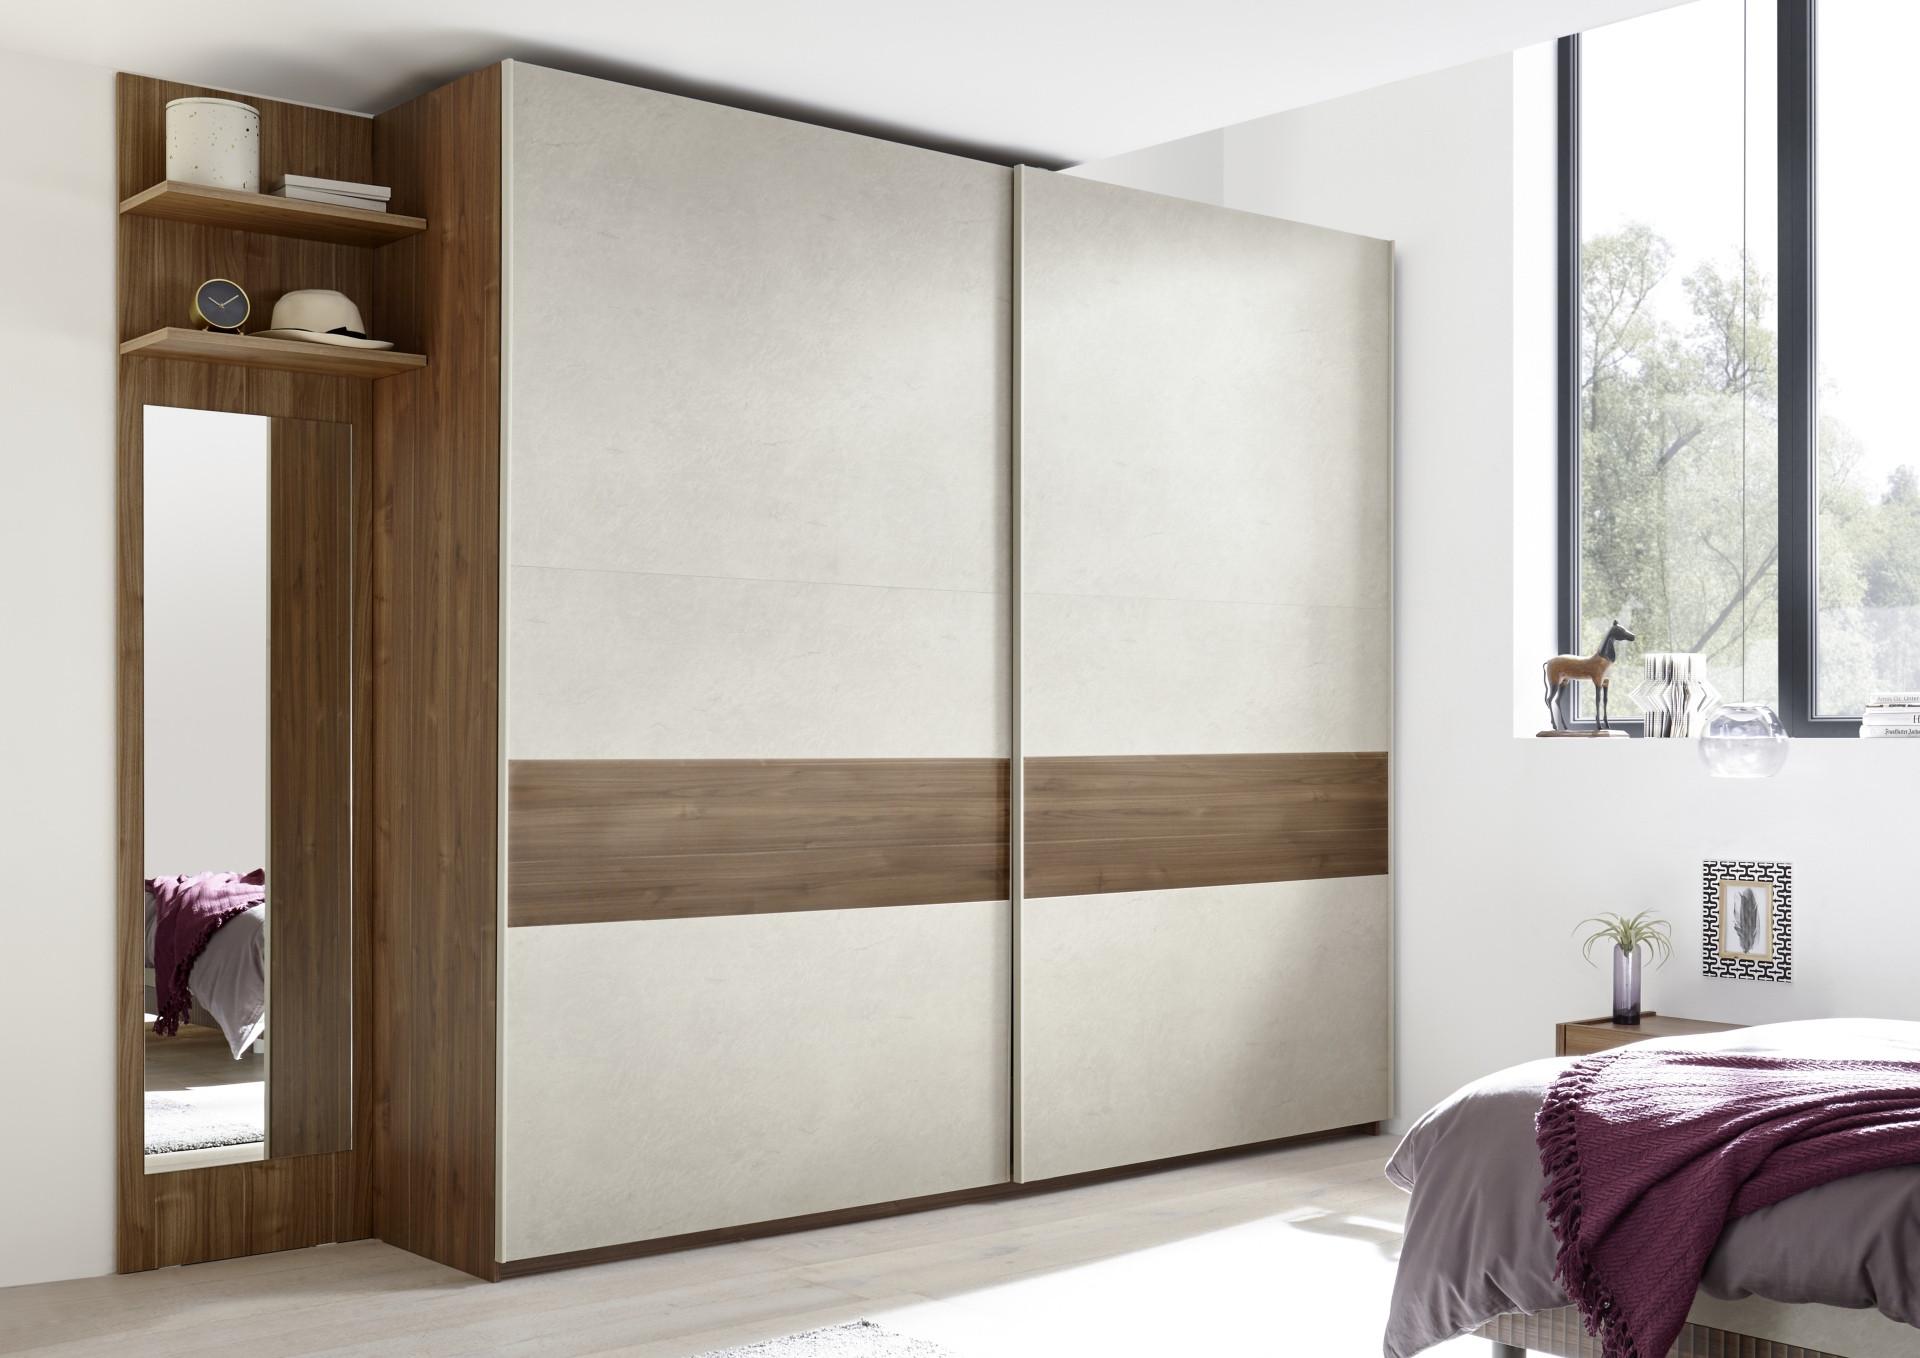 Amalti Iv Modern Wardrobe With Sliding Doors Wardrobes